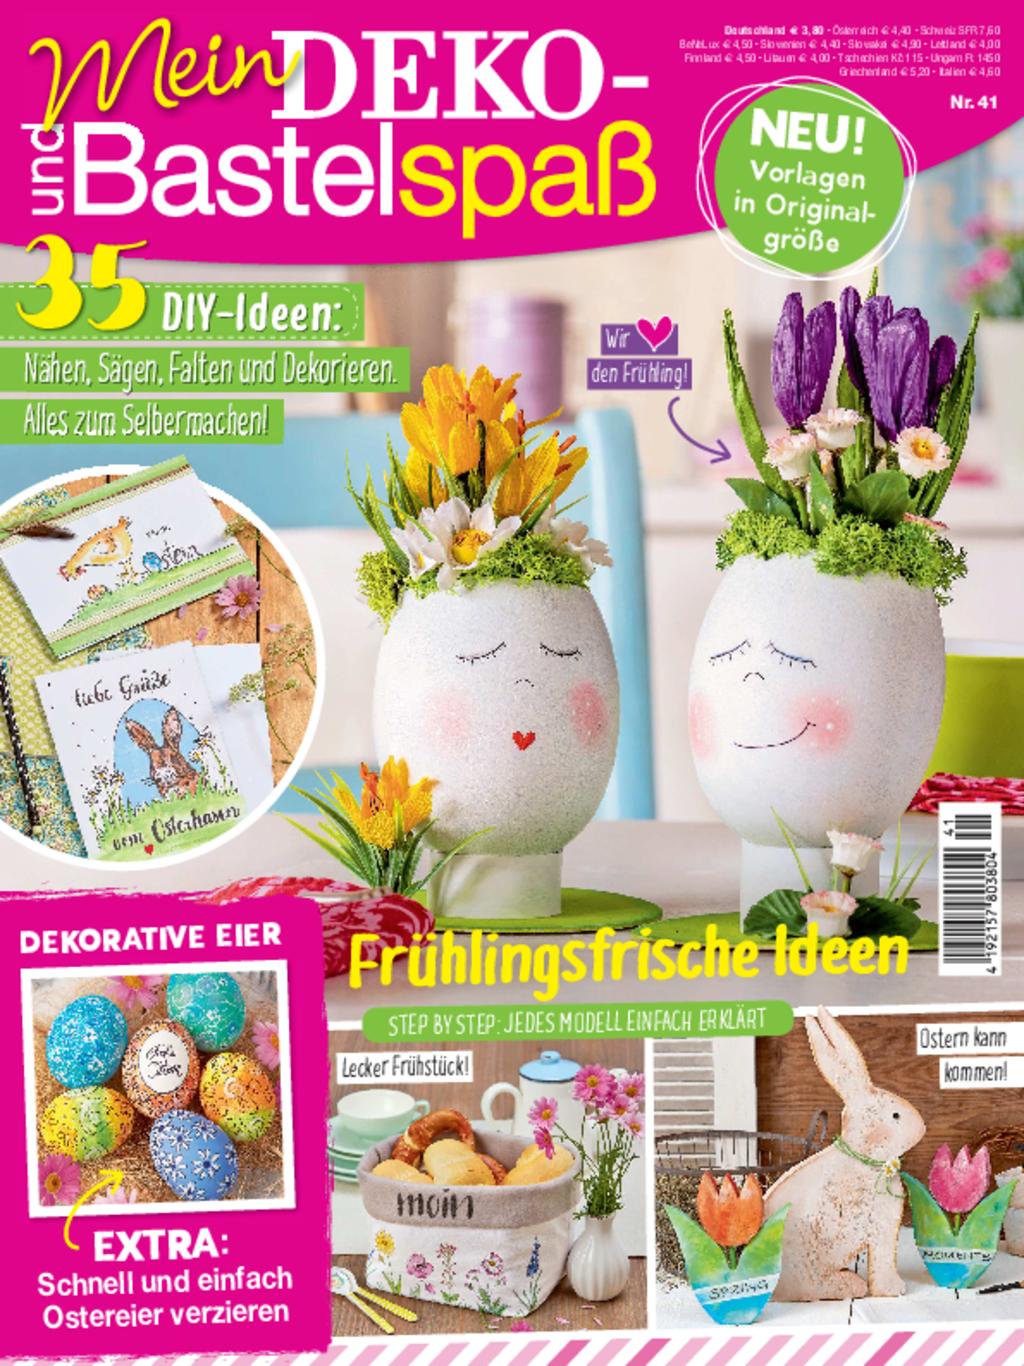 E-Paper: Mein Deko- und Bastelspaß Nr. 41/2021 - Frühlingsideen